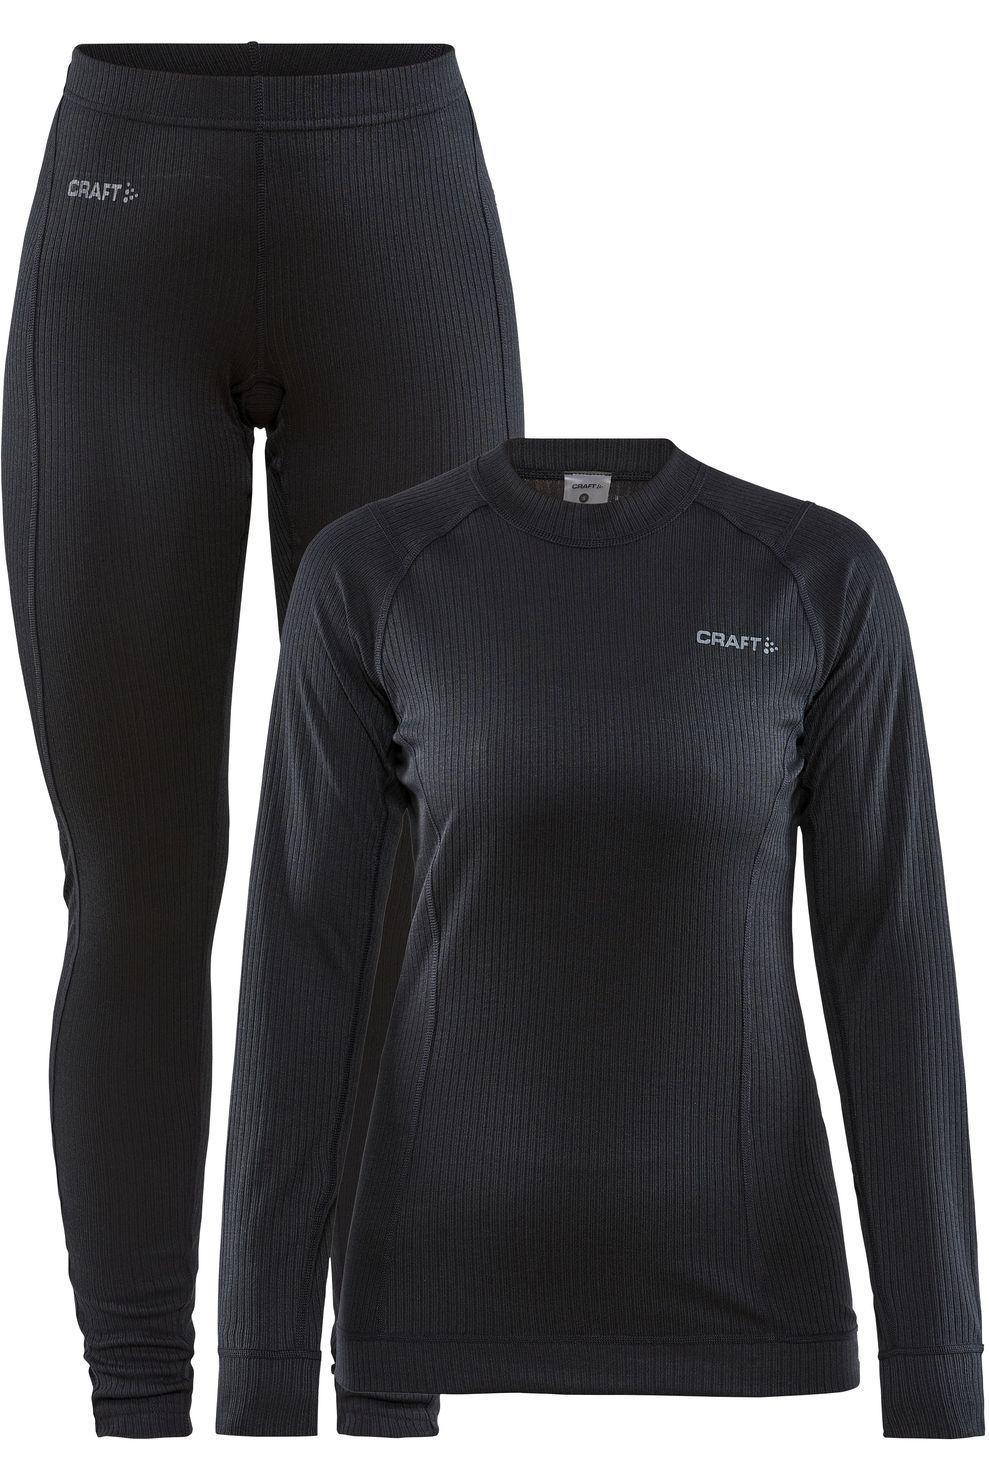 Craft Legging Core Dry Baselayer Set voor dames - Zwart - Maten: XS, M, L, XL, XXL - Nieuwe collecti